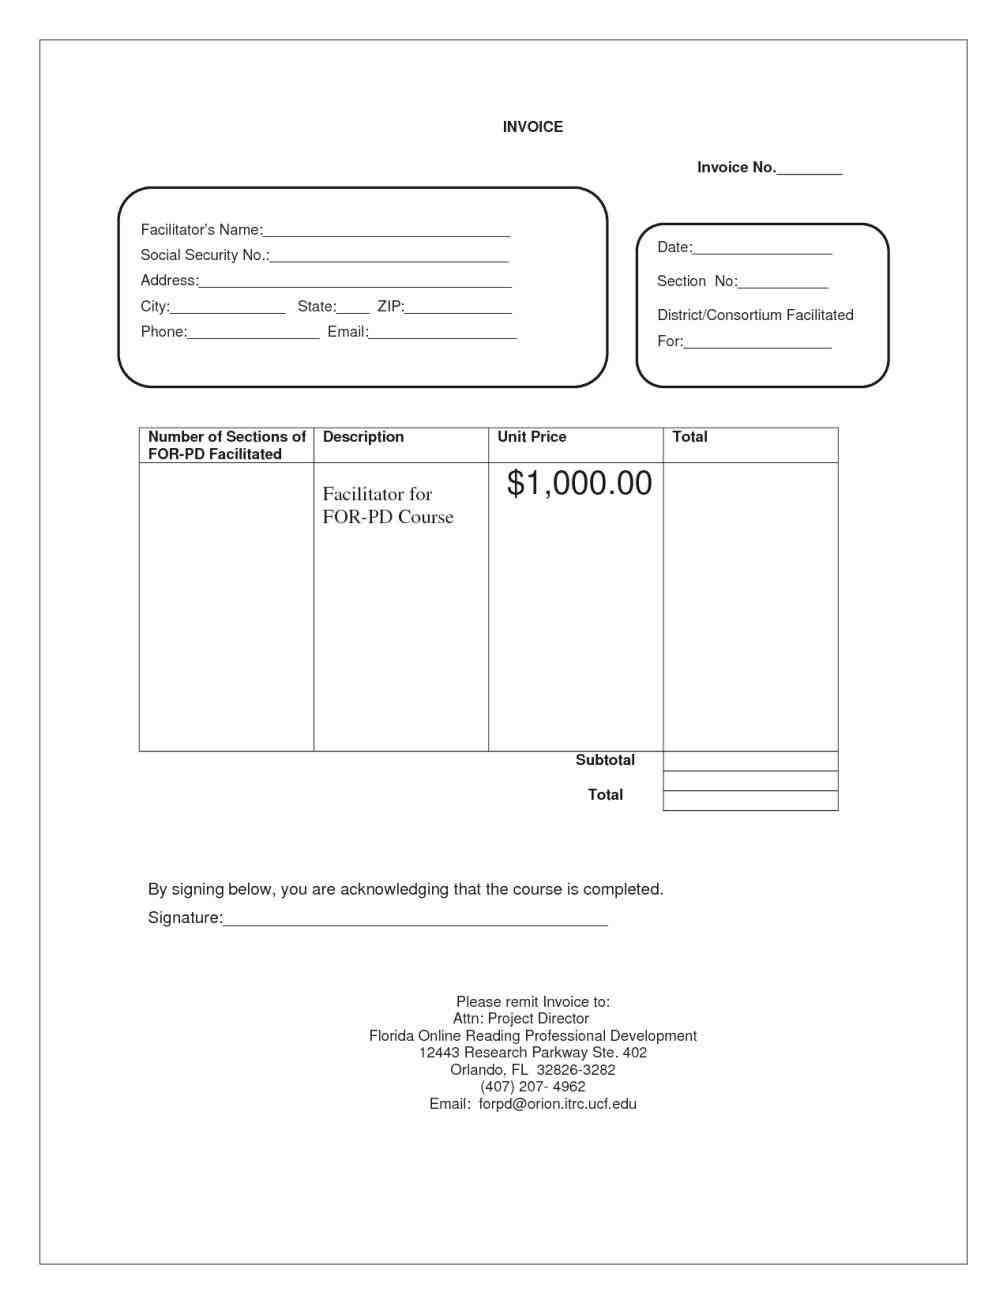 e rharmybaseus payment terms printable standard rhpinterestcom invoice Invoice Template Excel Australia template payment terms free printable standard rhpinterestcom format in